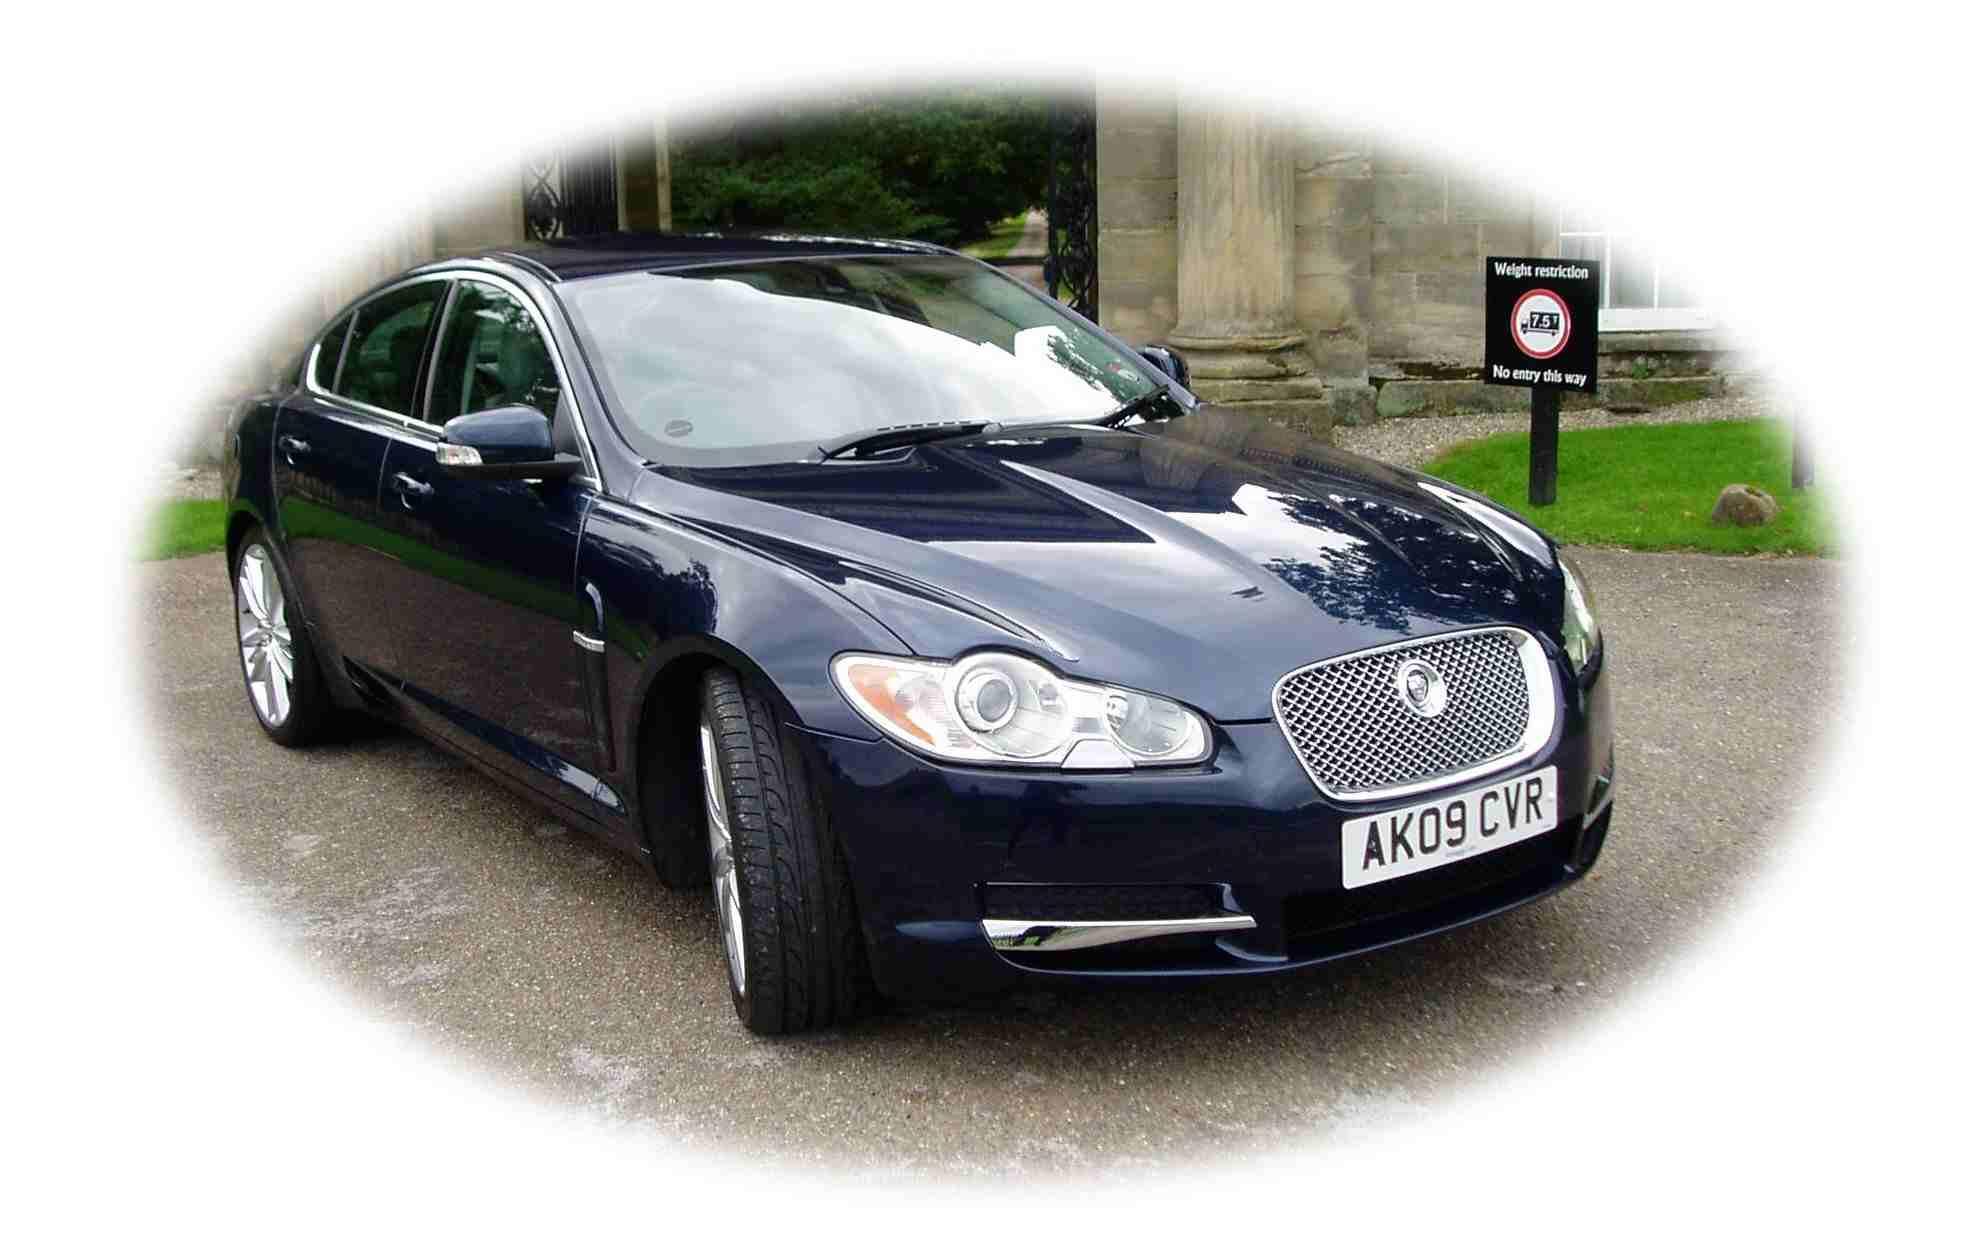 Jaguar Drivers Club - East Midlands